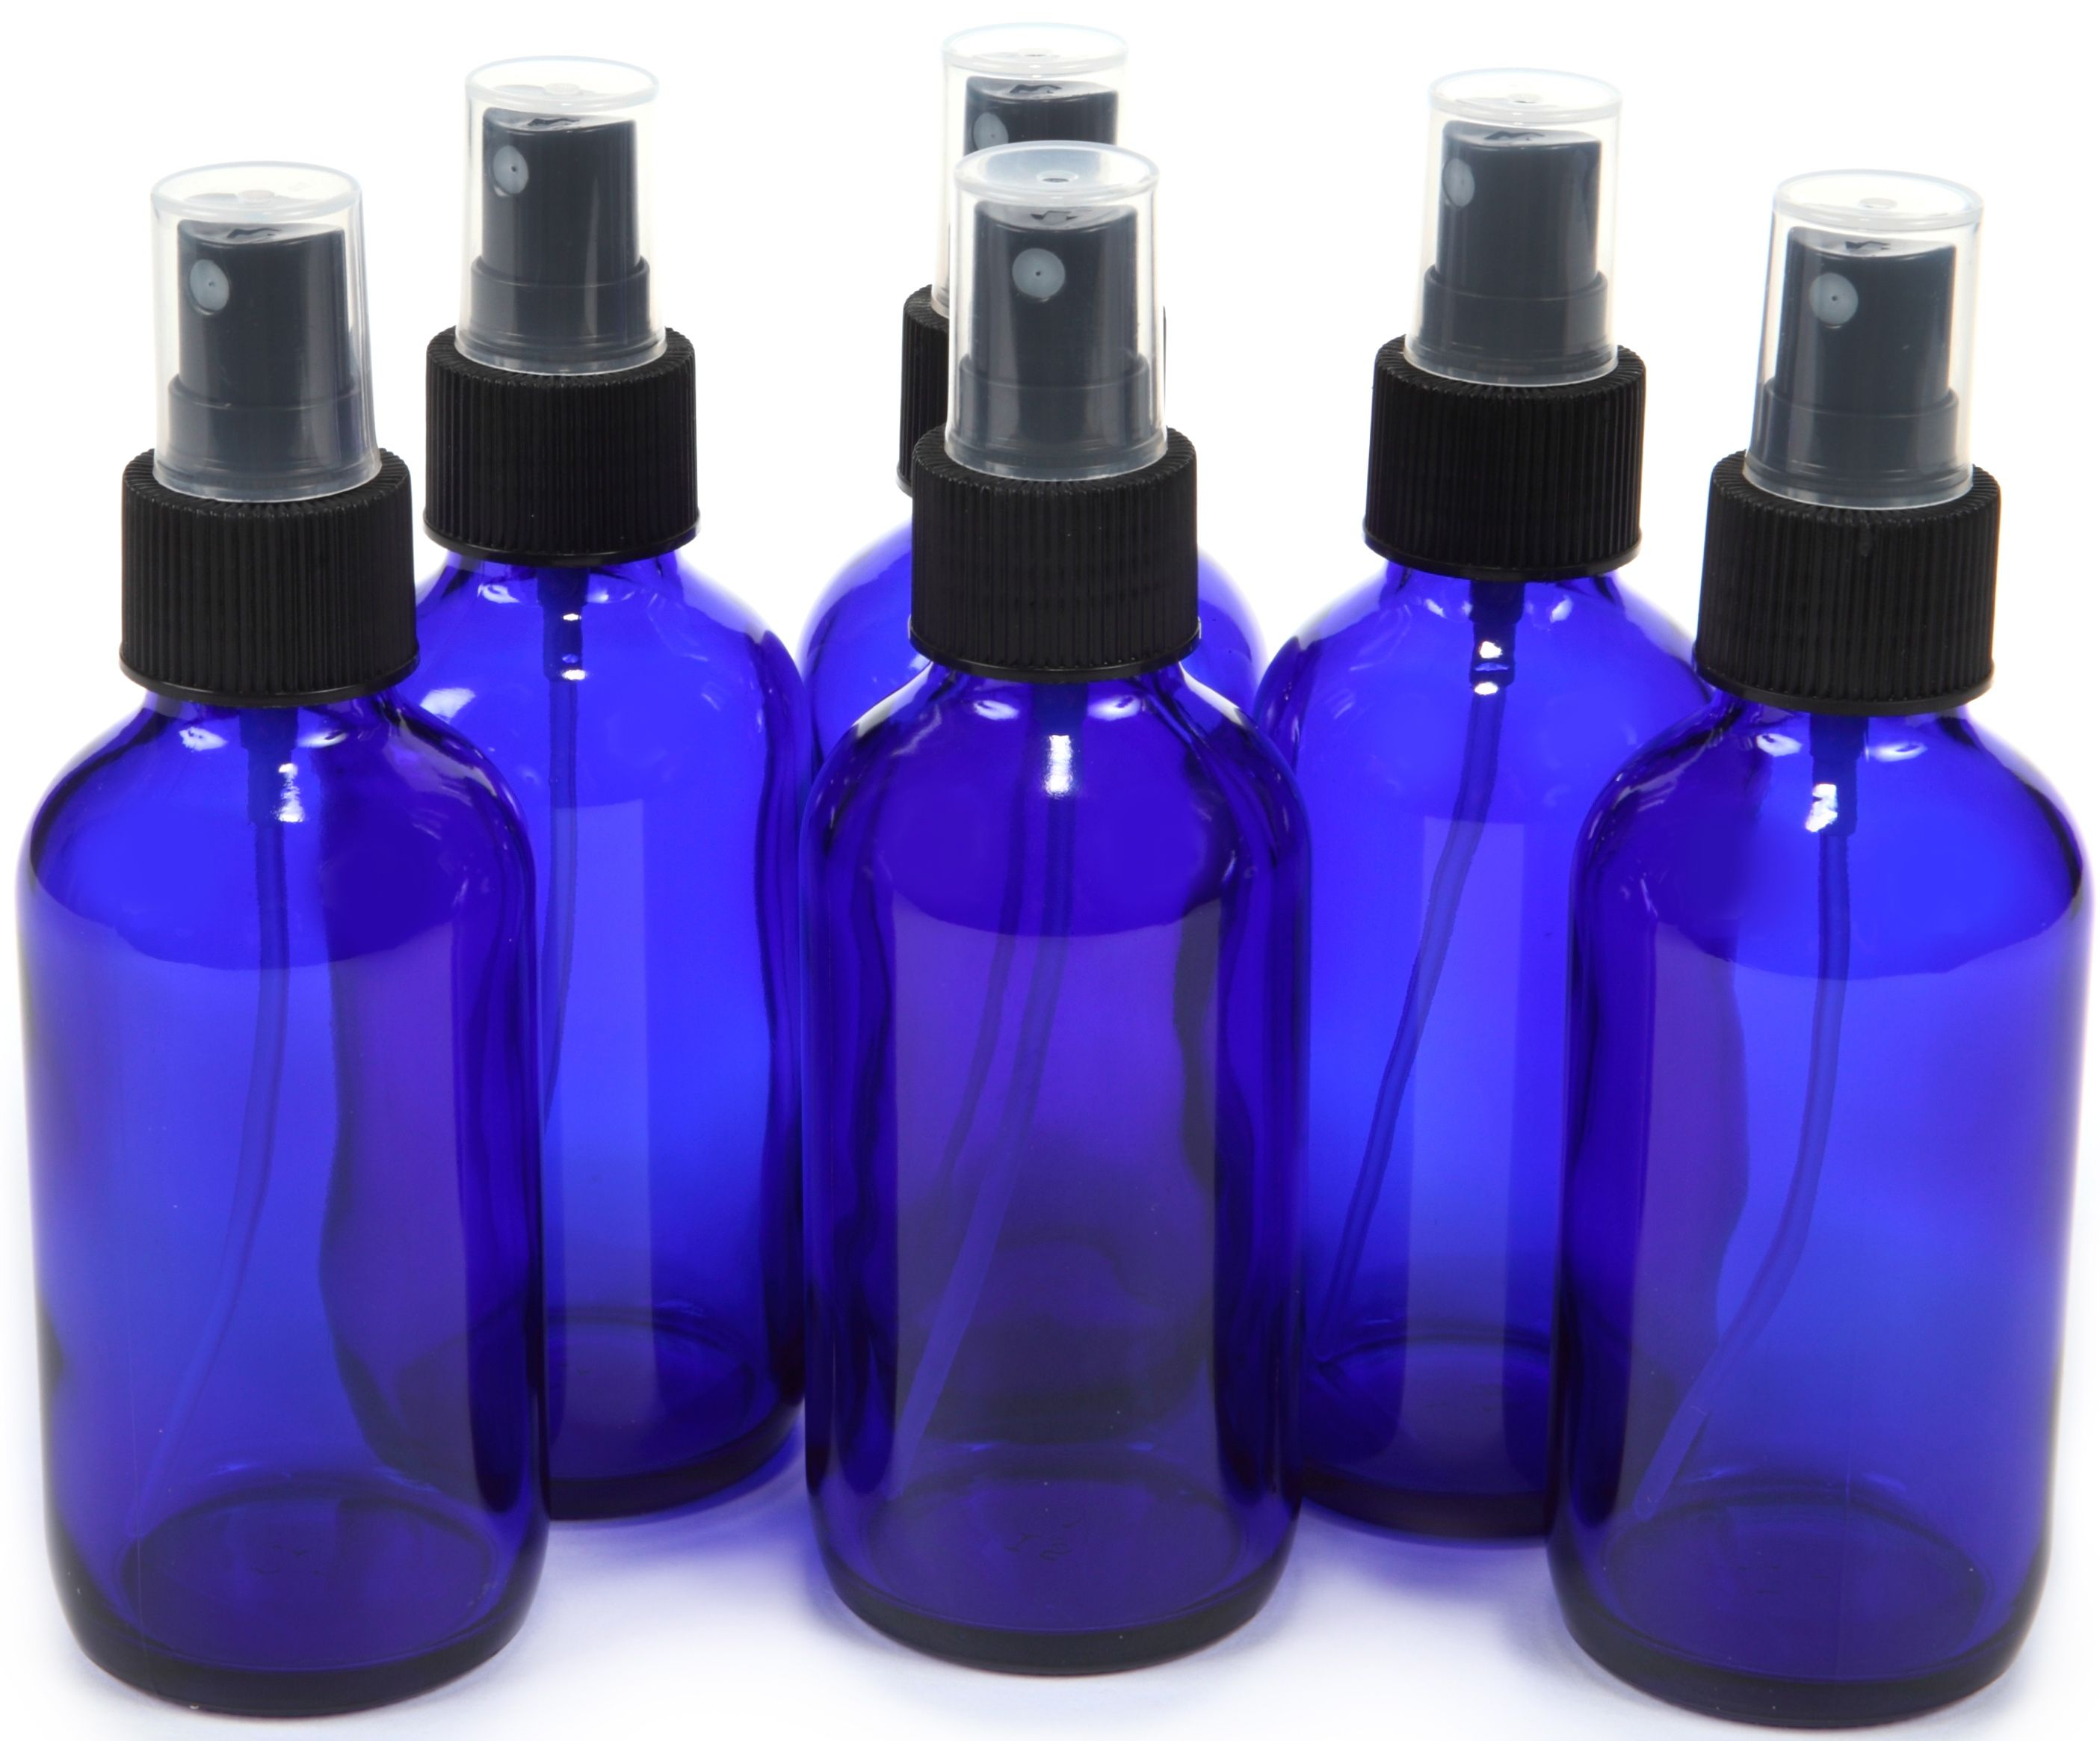 Glass Bottles With Fine Mist Sprayers Vivaplex